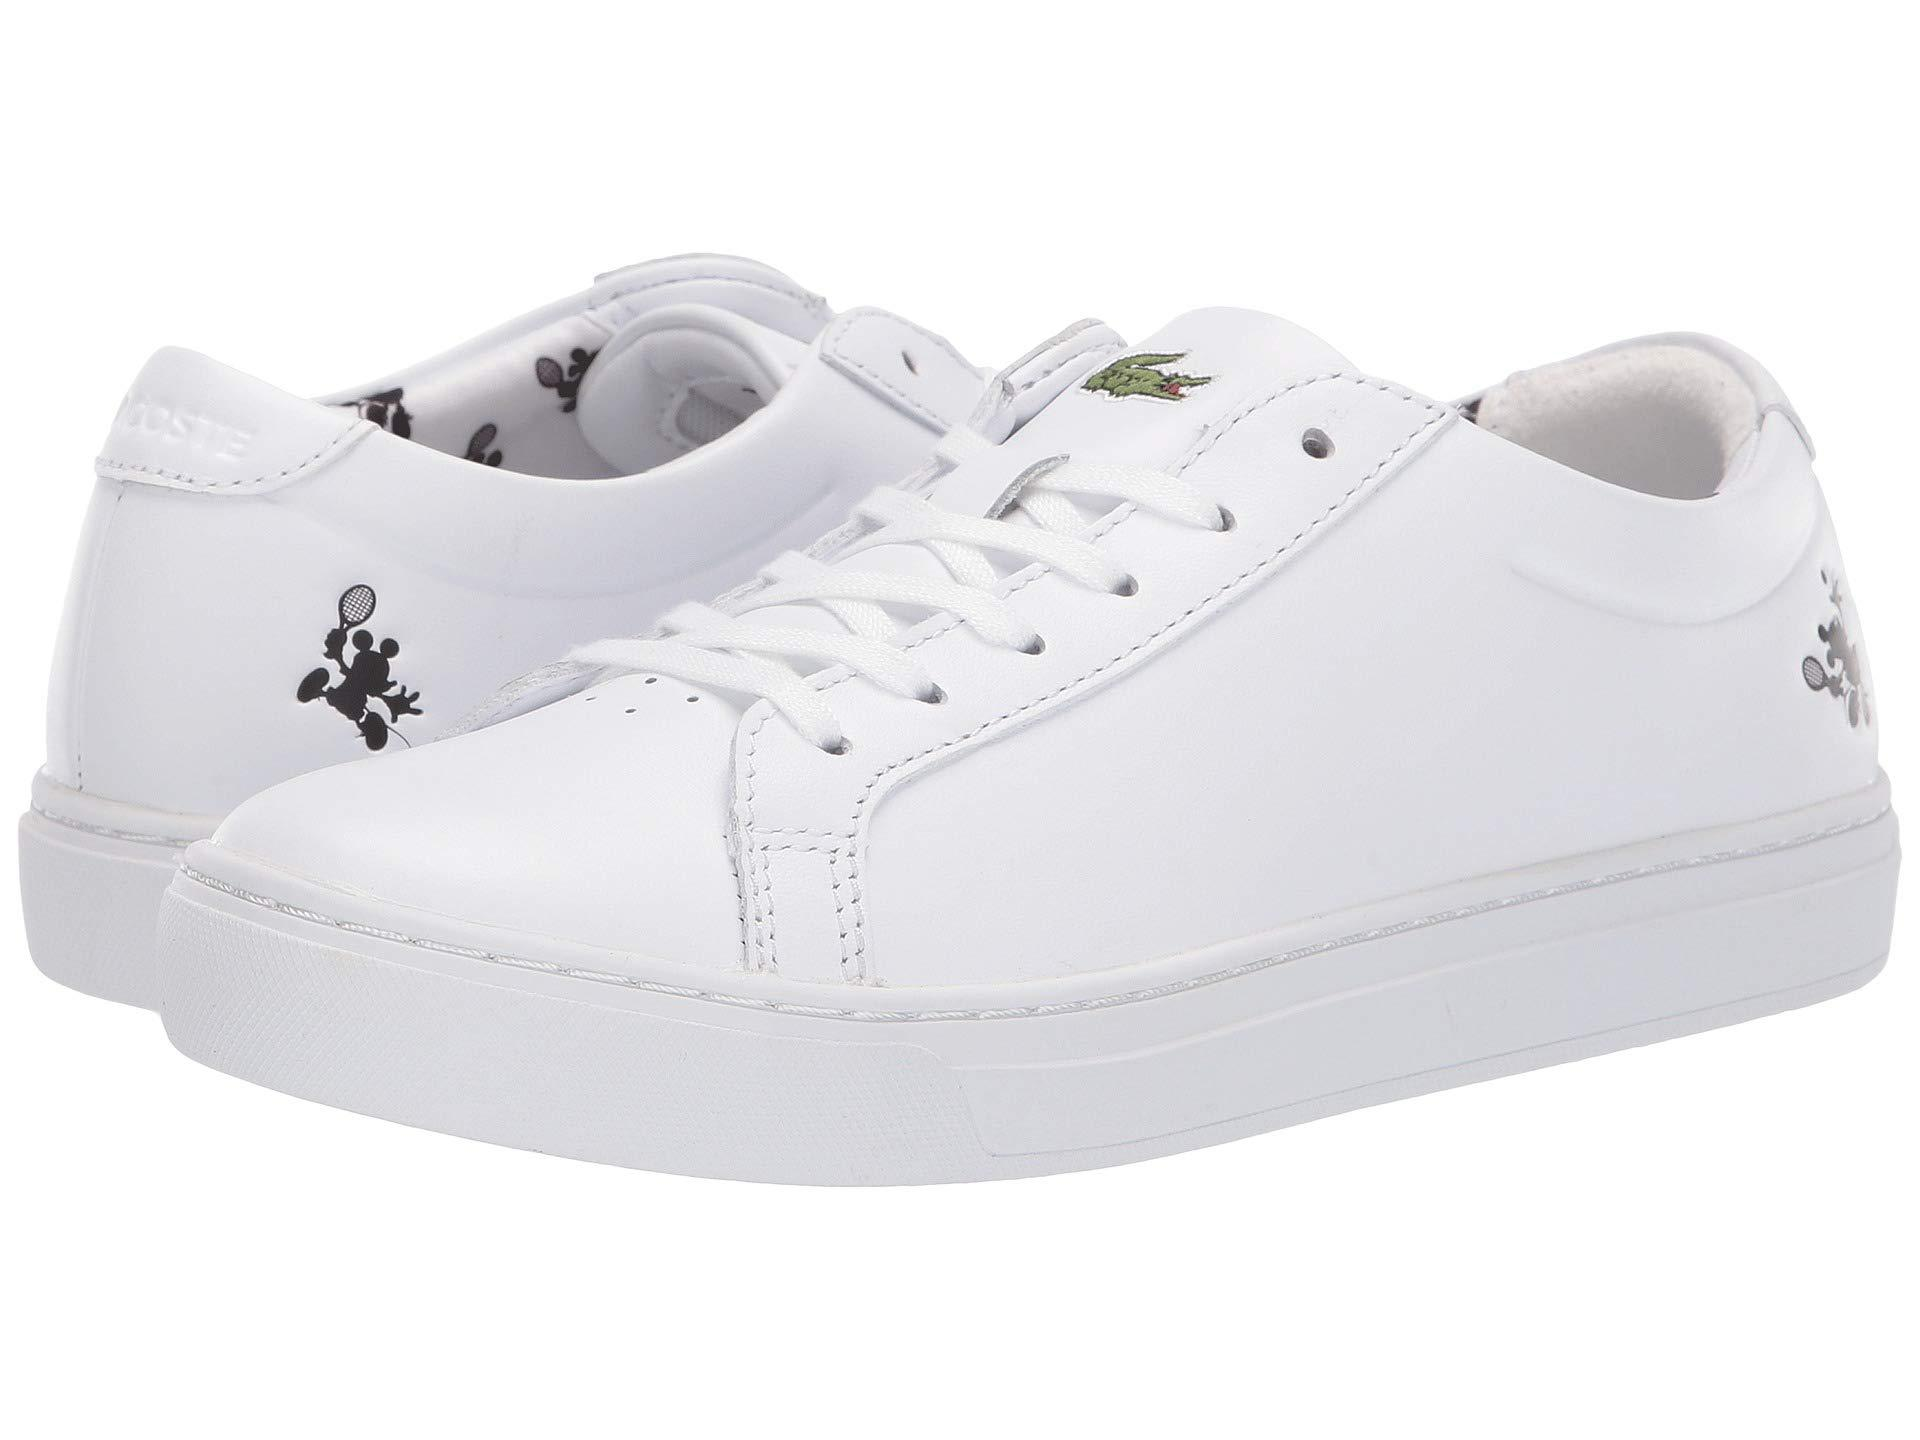 0bd4fd7c8 Lyst - Lacoste L.12.12 418 1 Disney (white) Women s Shoes in White